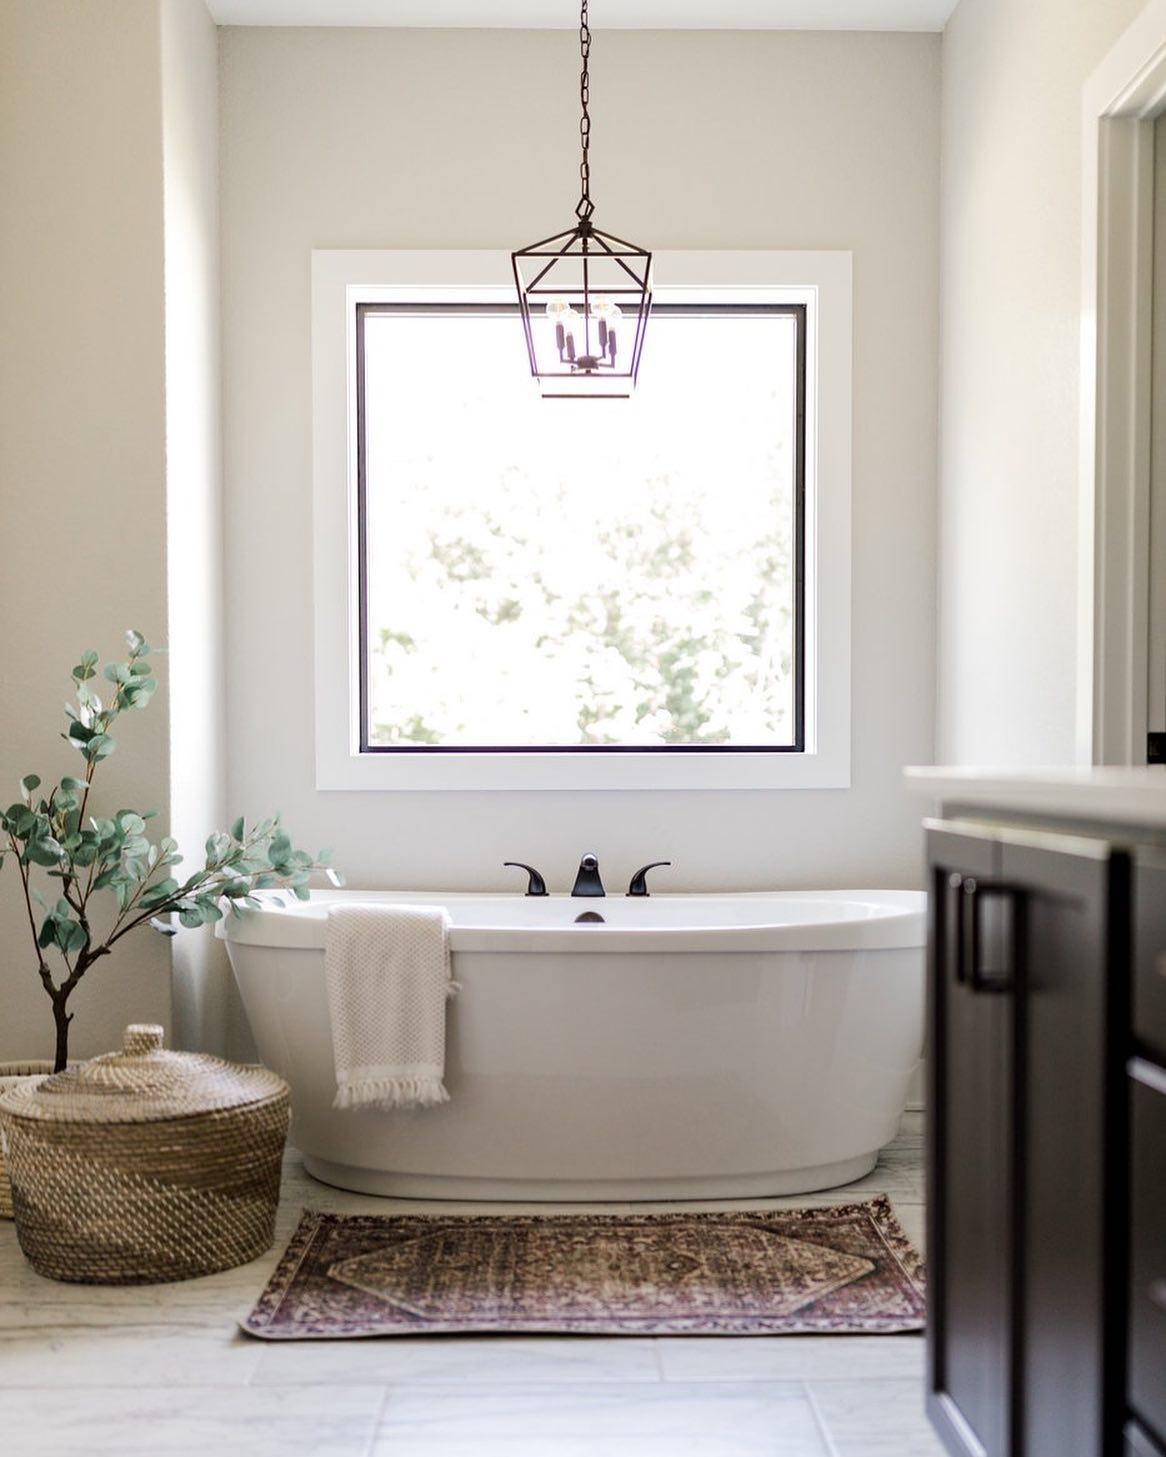 Square picture window over bathtub lets light into spa like bathroom